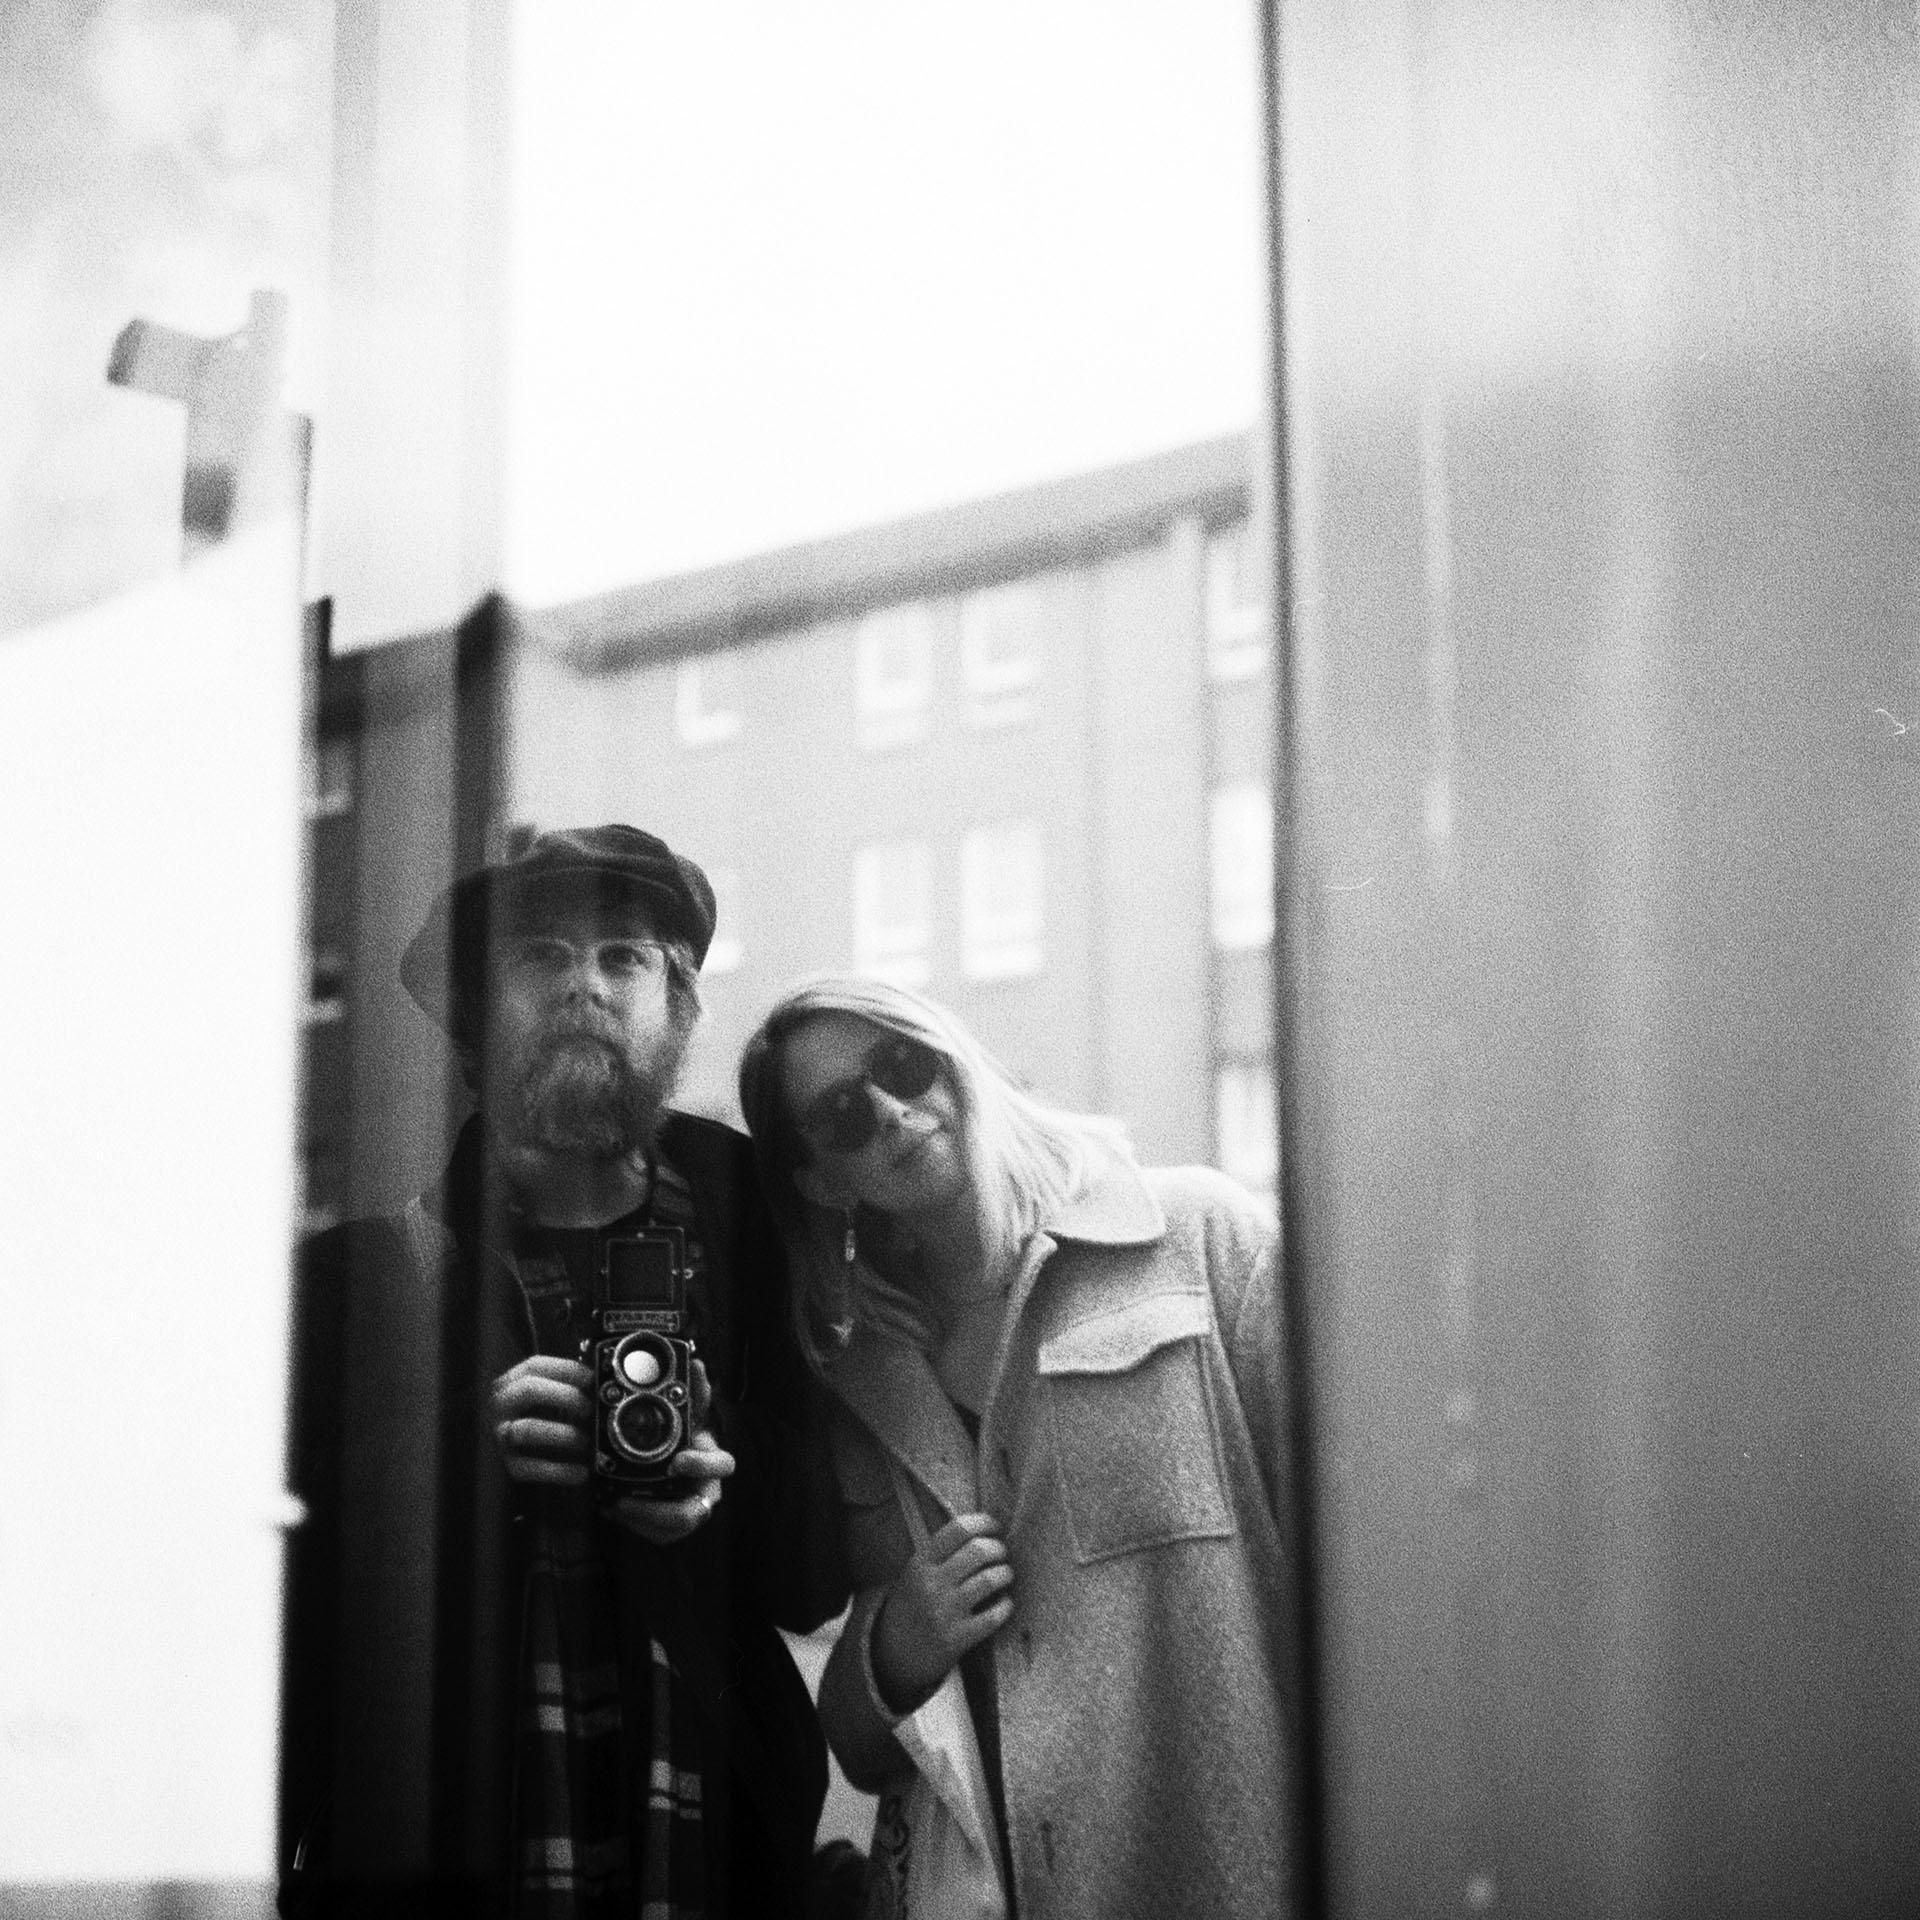 Rolleiflex self portrait